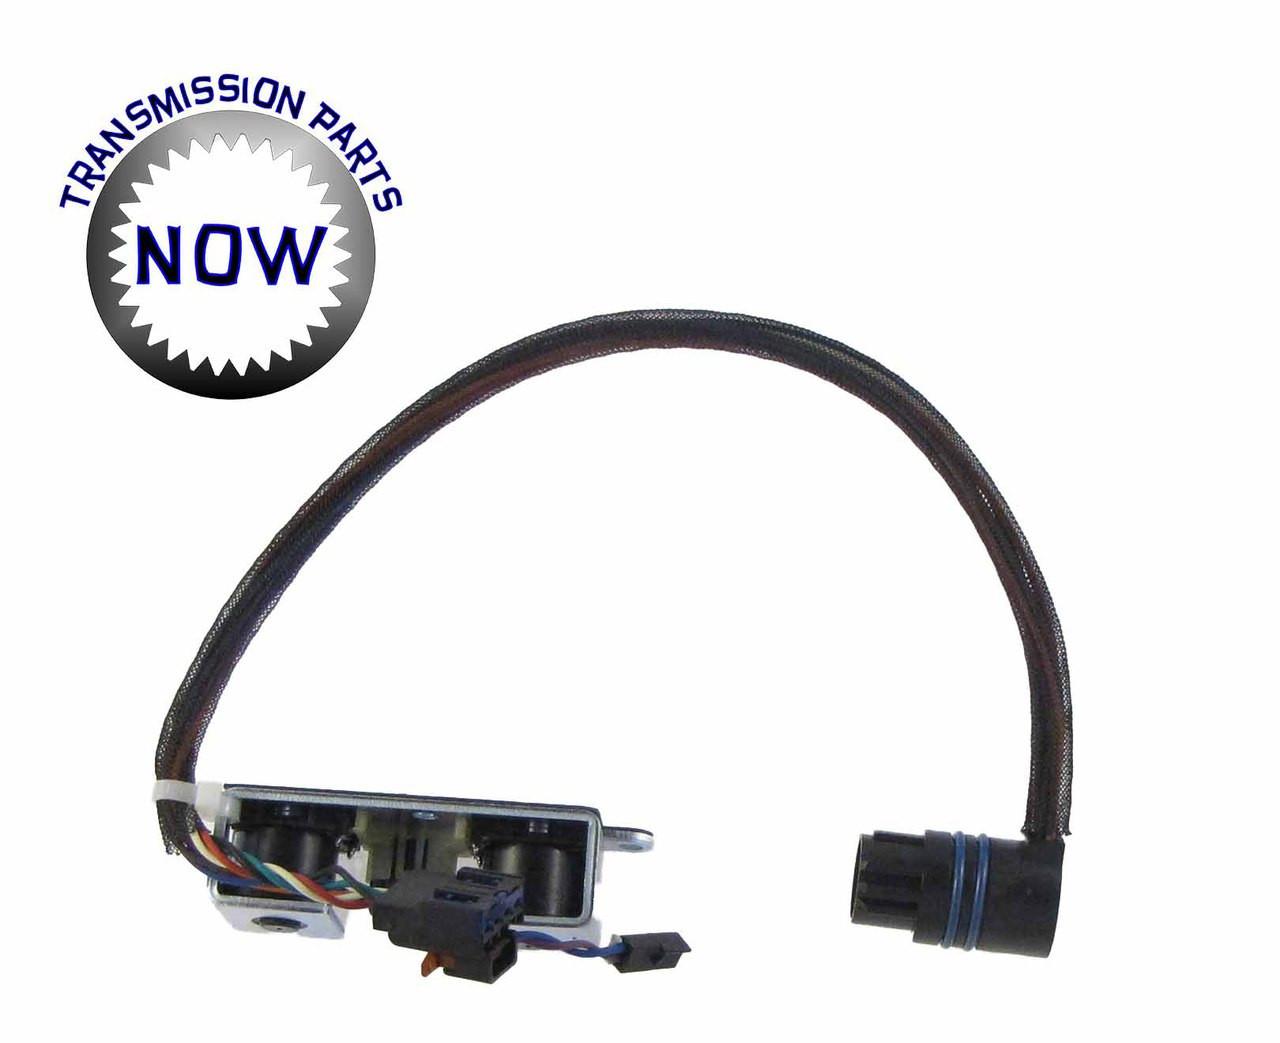 medium resolution of 4r75w transmission valve body diagram c5 transmission 4l60e accumulator installation 4l60e transmission wiring connector diagram